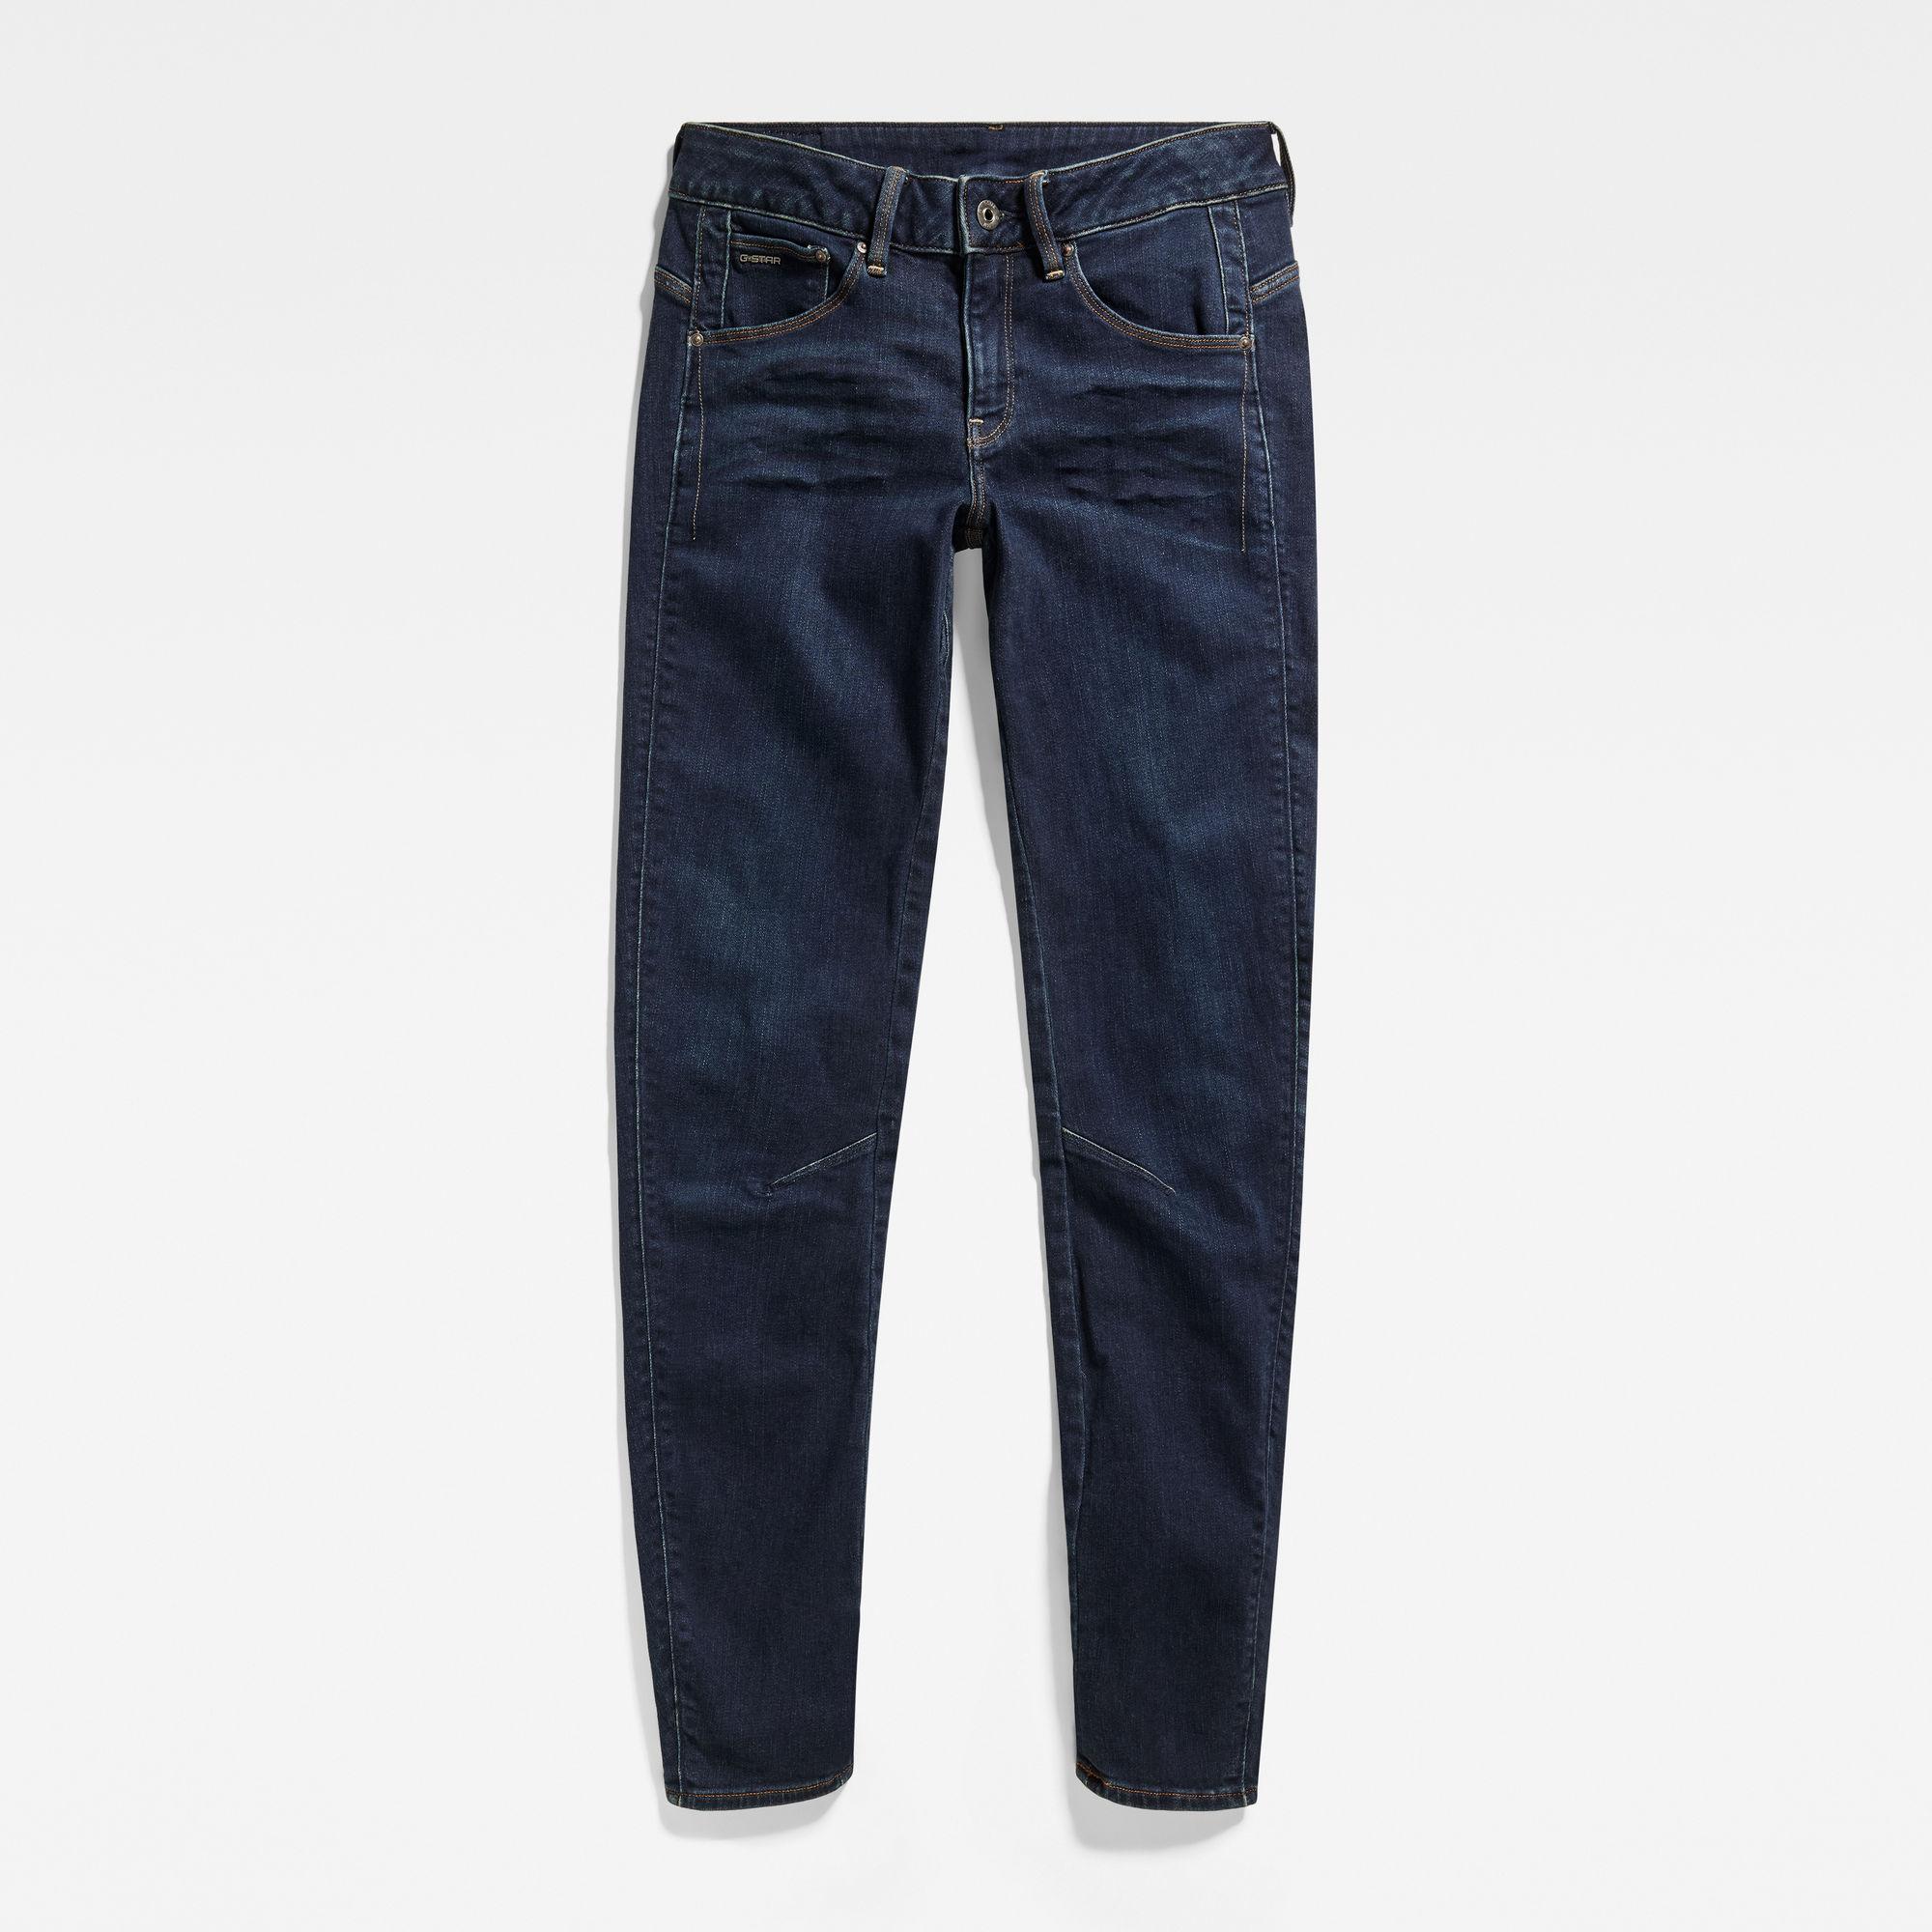 Arc 3D Mid Waist Skinny Jeans